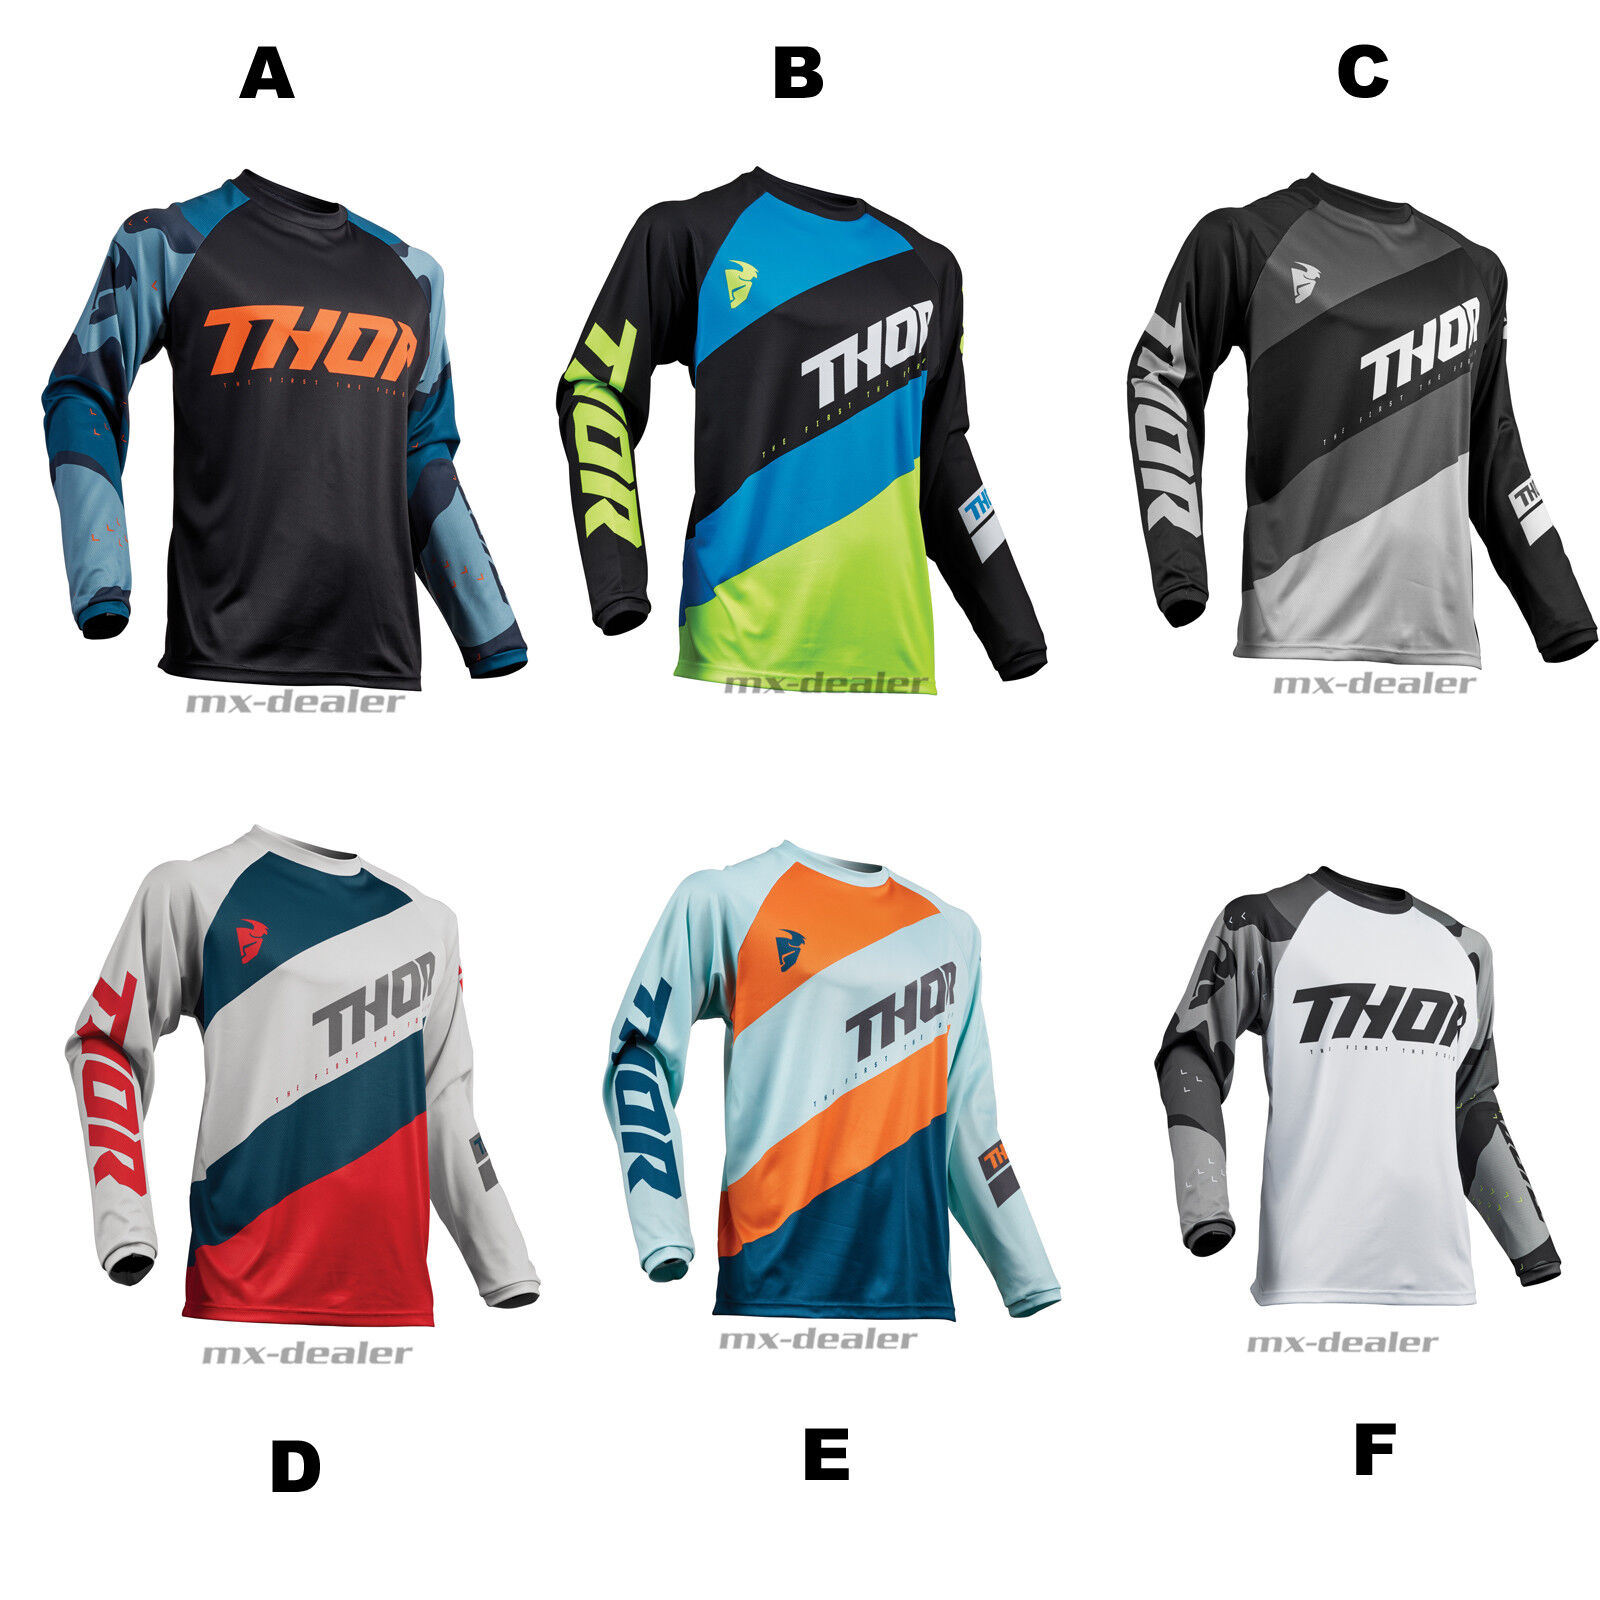 2019 Thor Sector Cross Jersey Trikot motocross Enduro MX BMX DH MTB Quad Offroad